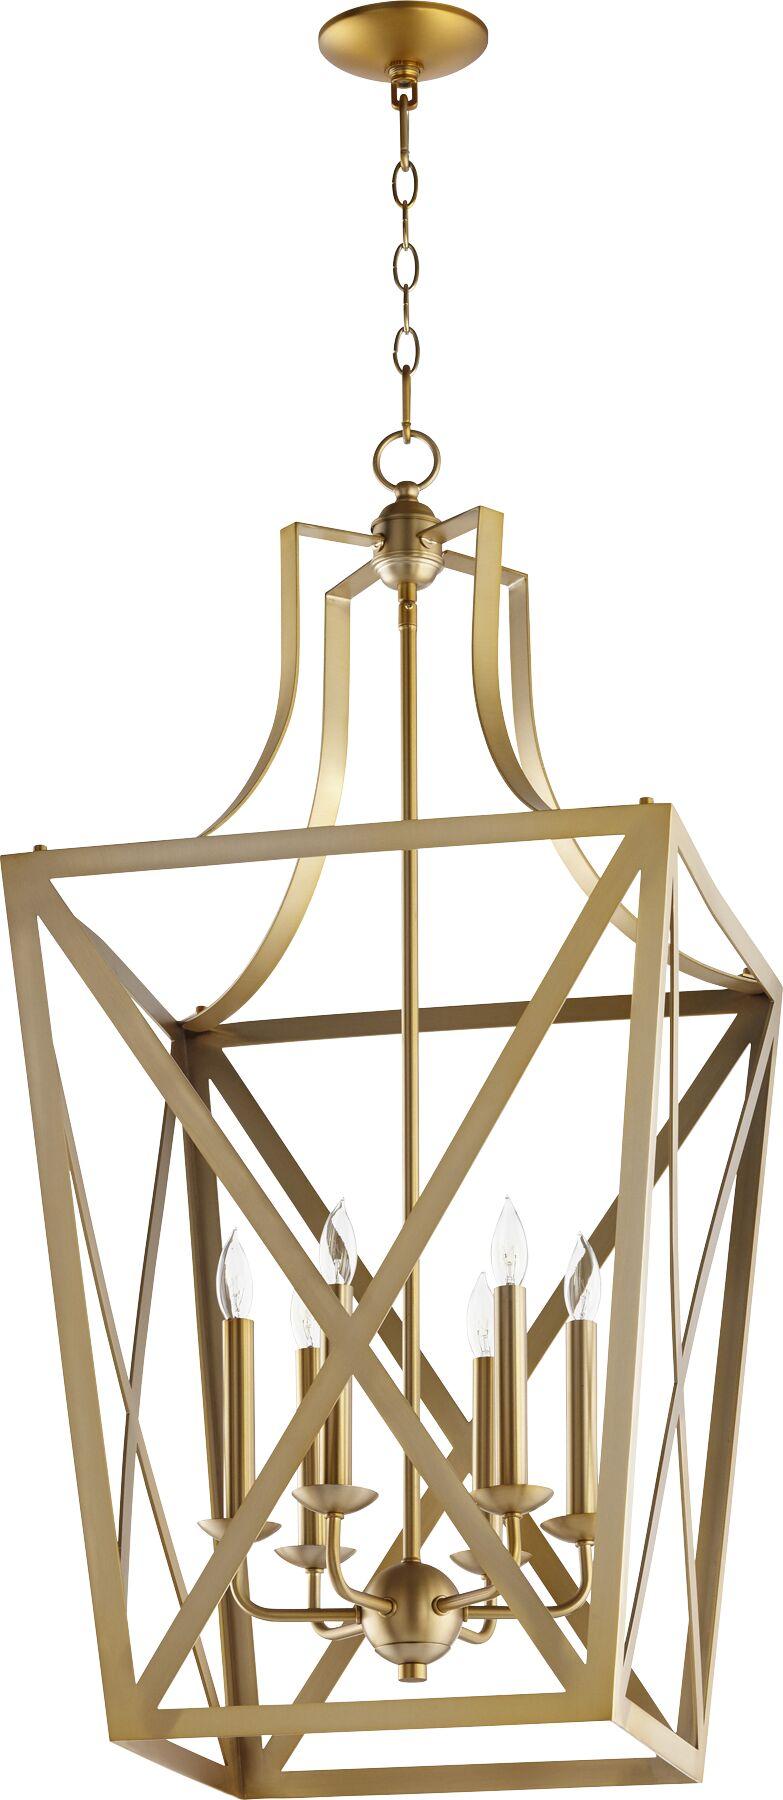 Trap Entry 6-Light Foyer Pendant Finish: Aged Brass